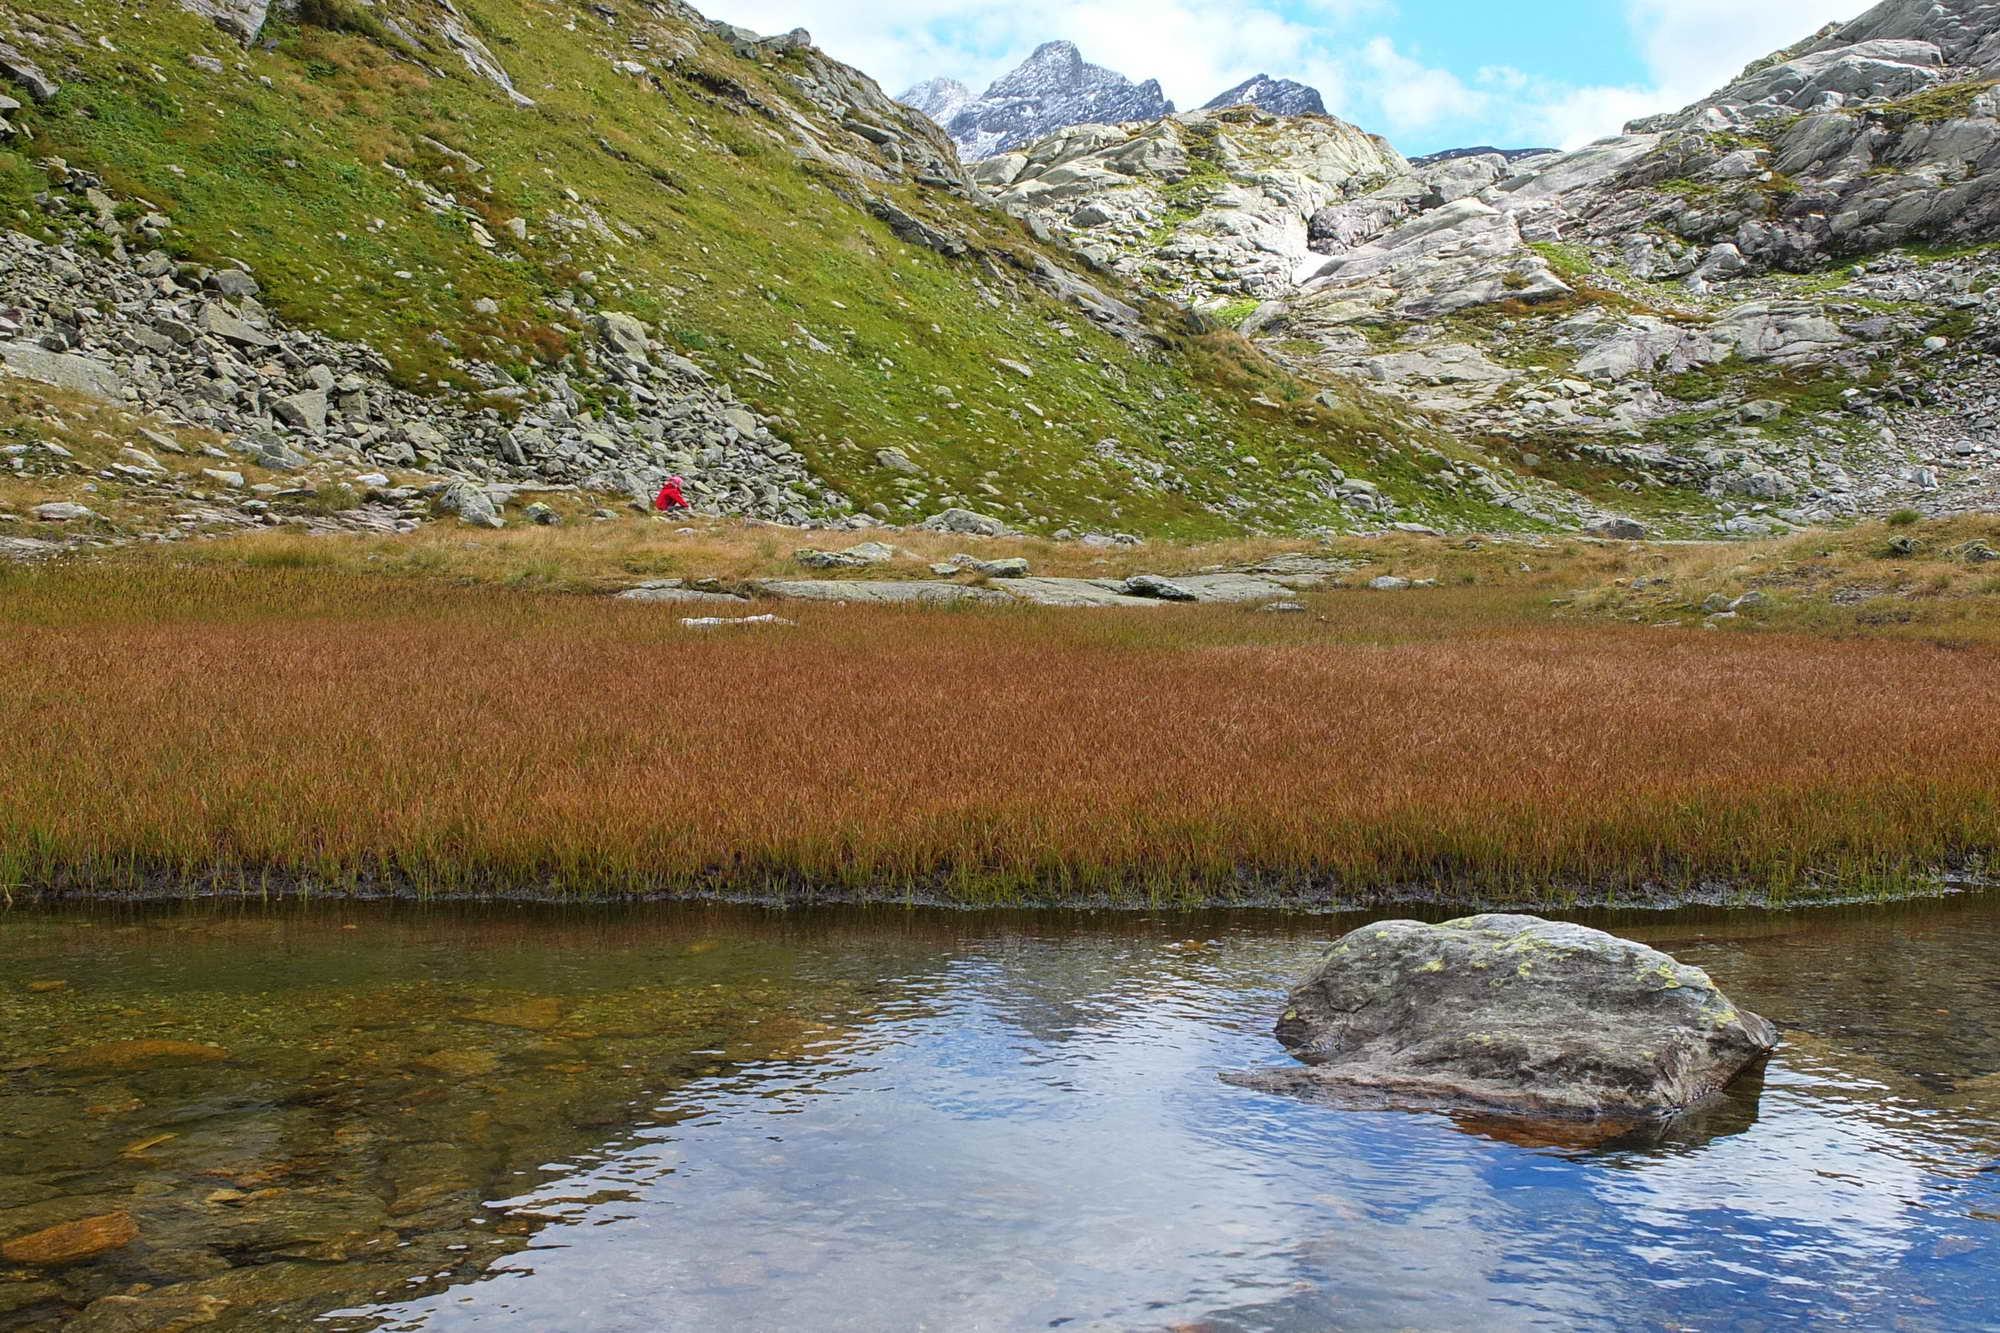 MT 7.1 (Rabius)/Runcahez > Terrihütte (Graubünden)